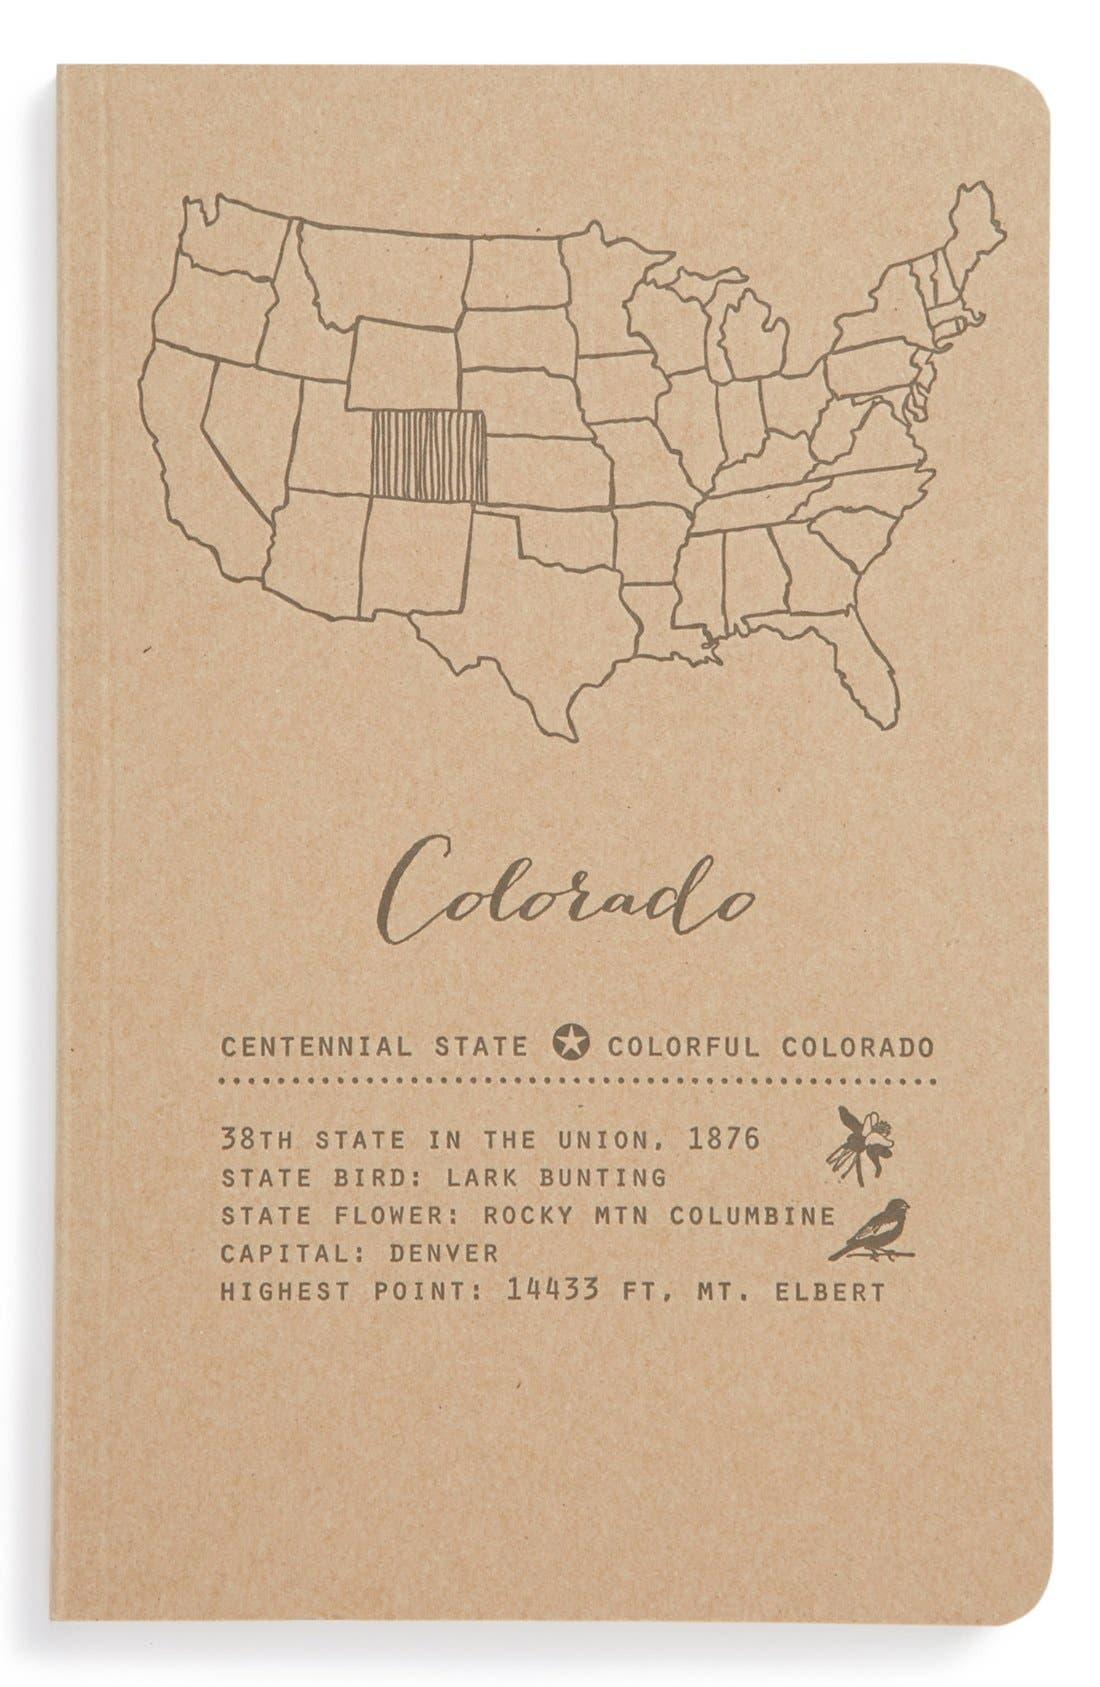 Alternate Image 1 Selected - Blackbird Letterpress 'Colorado' Journal